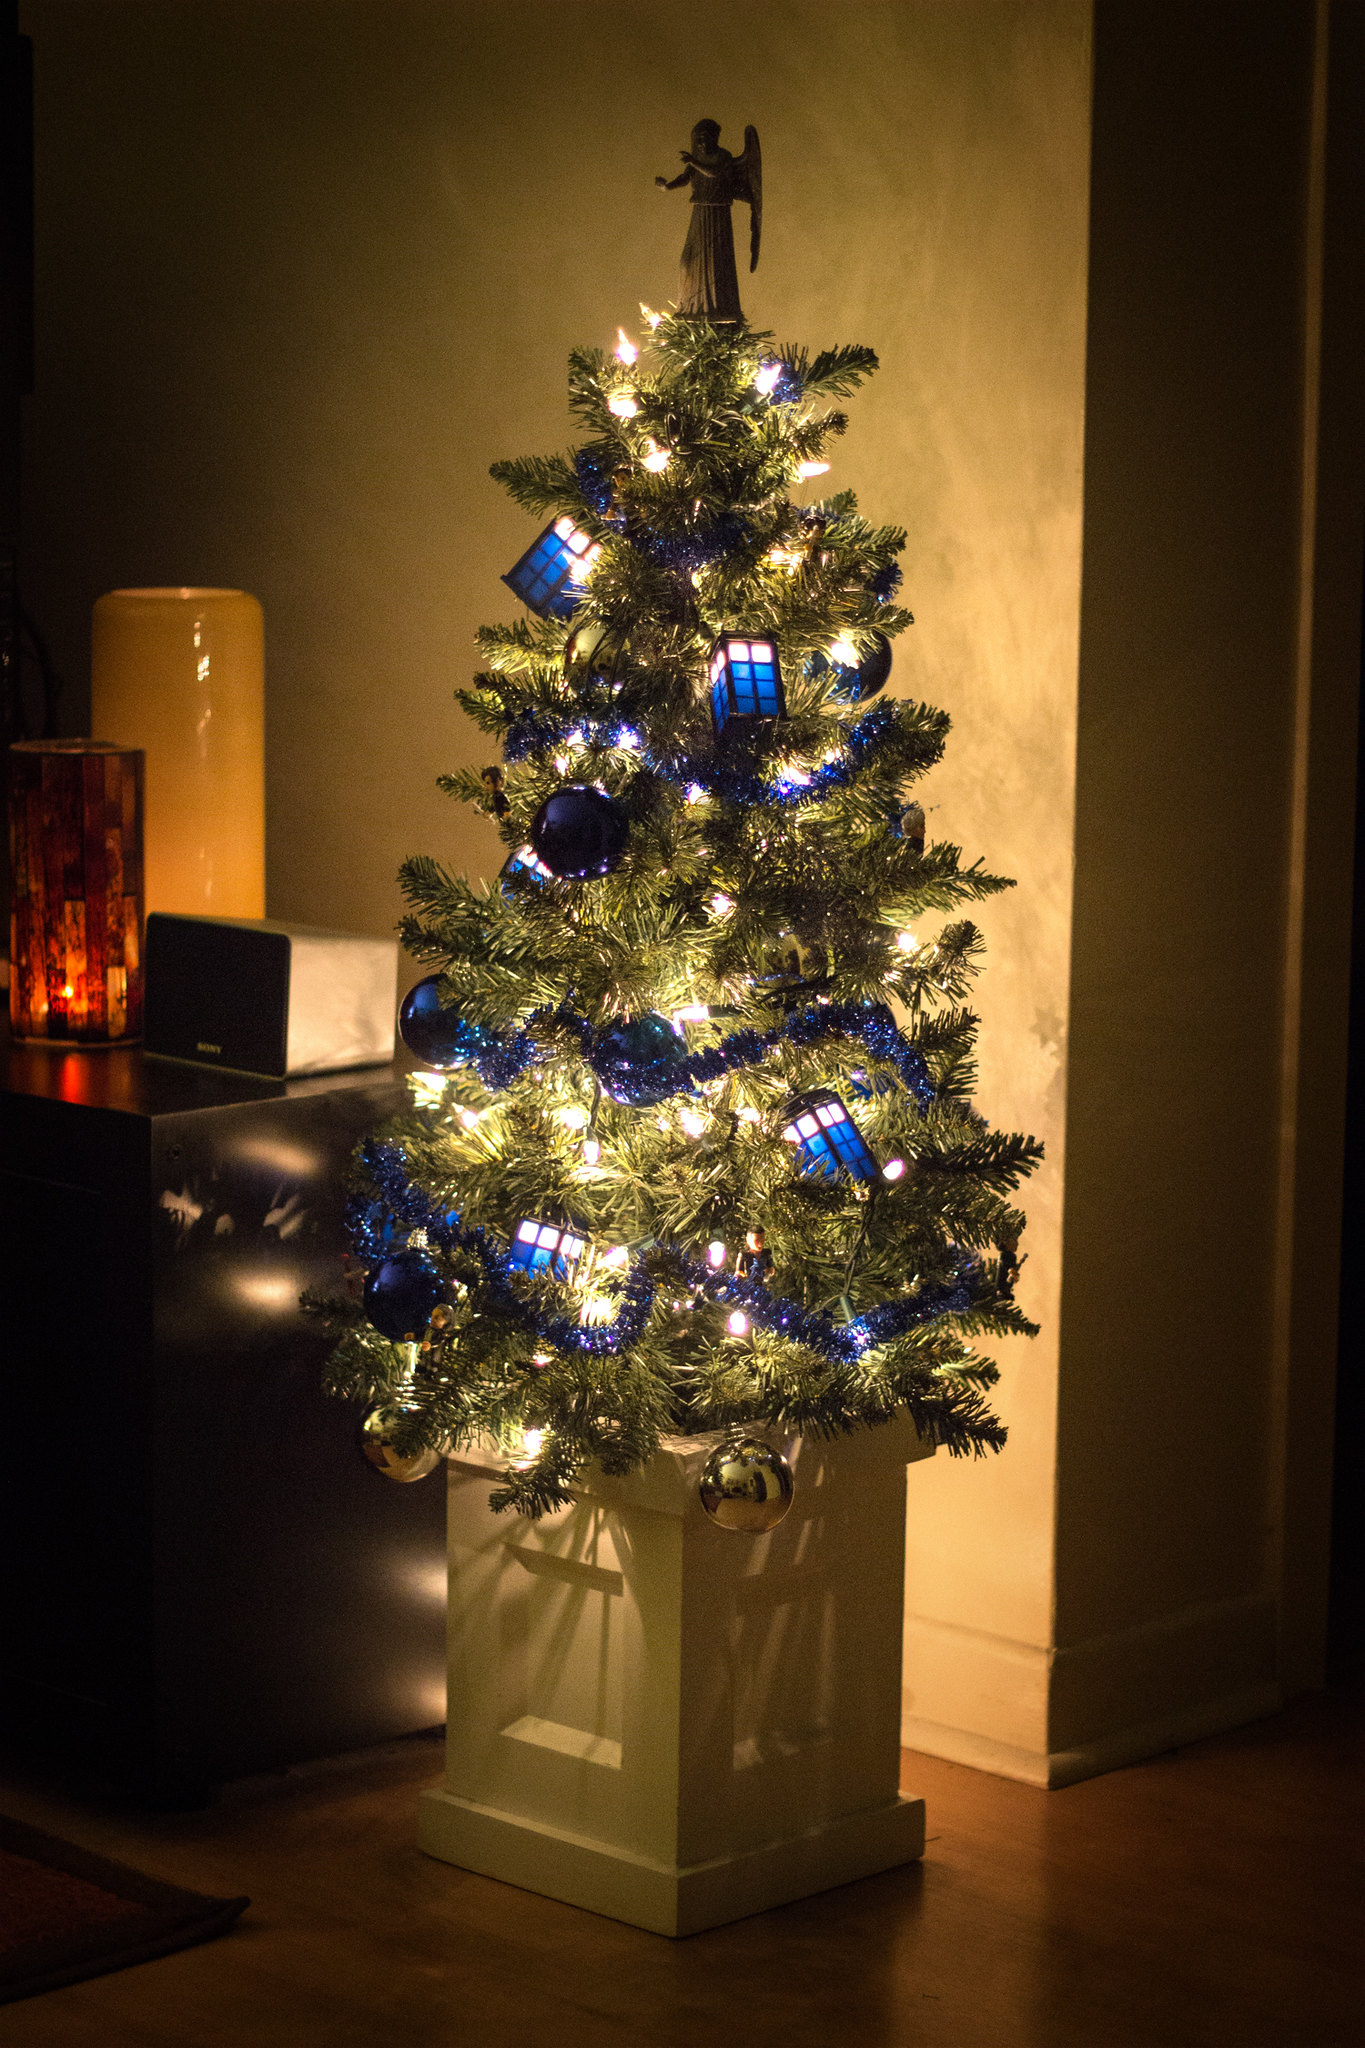 Doctor Who Themed Christmas Tree